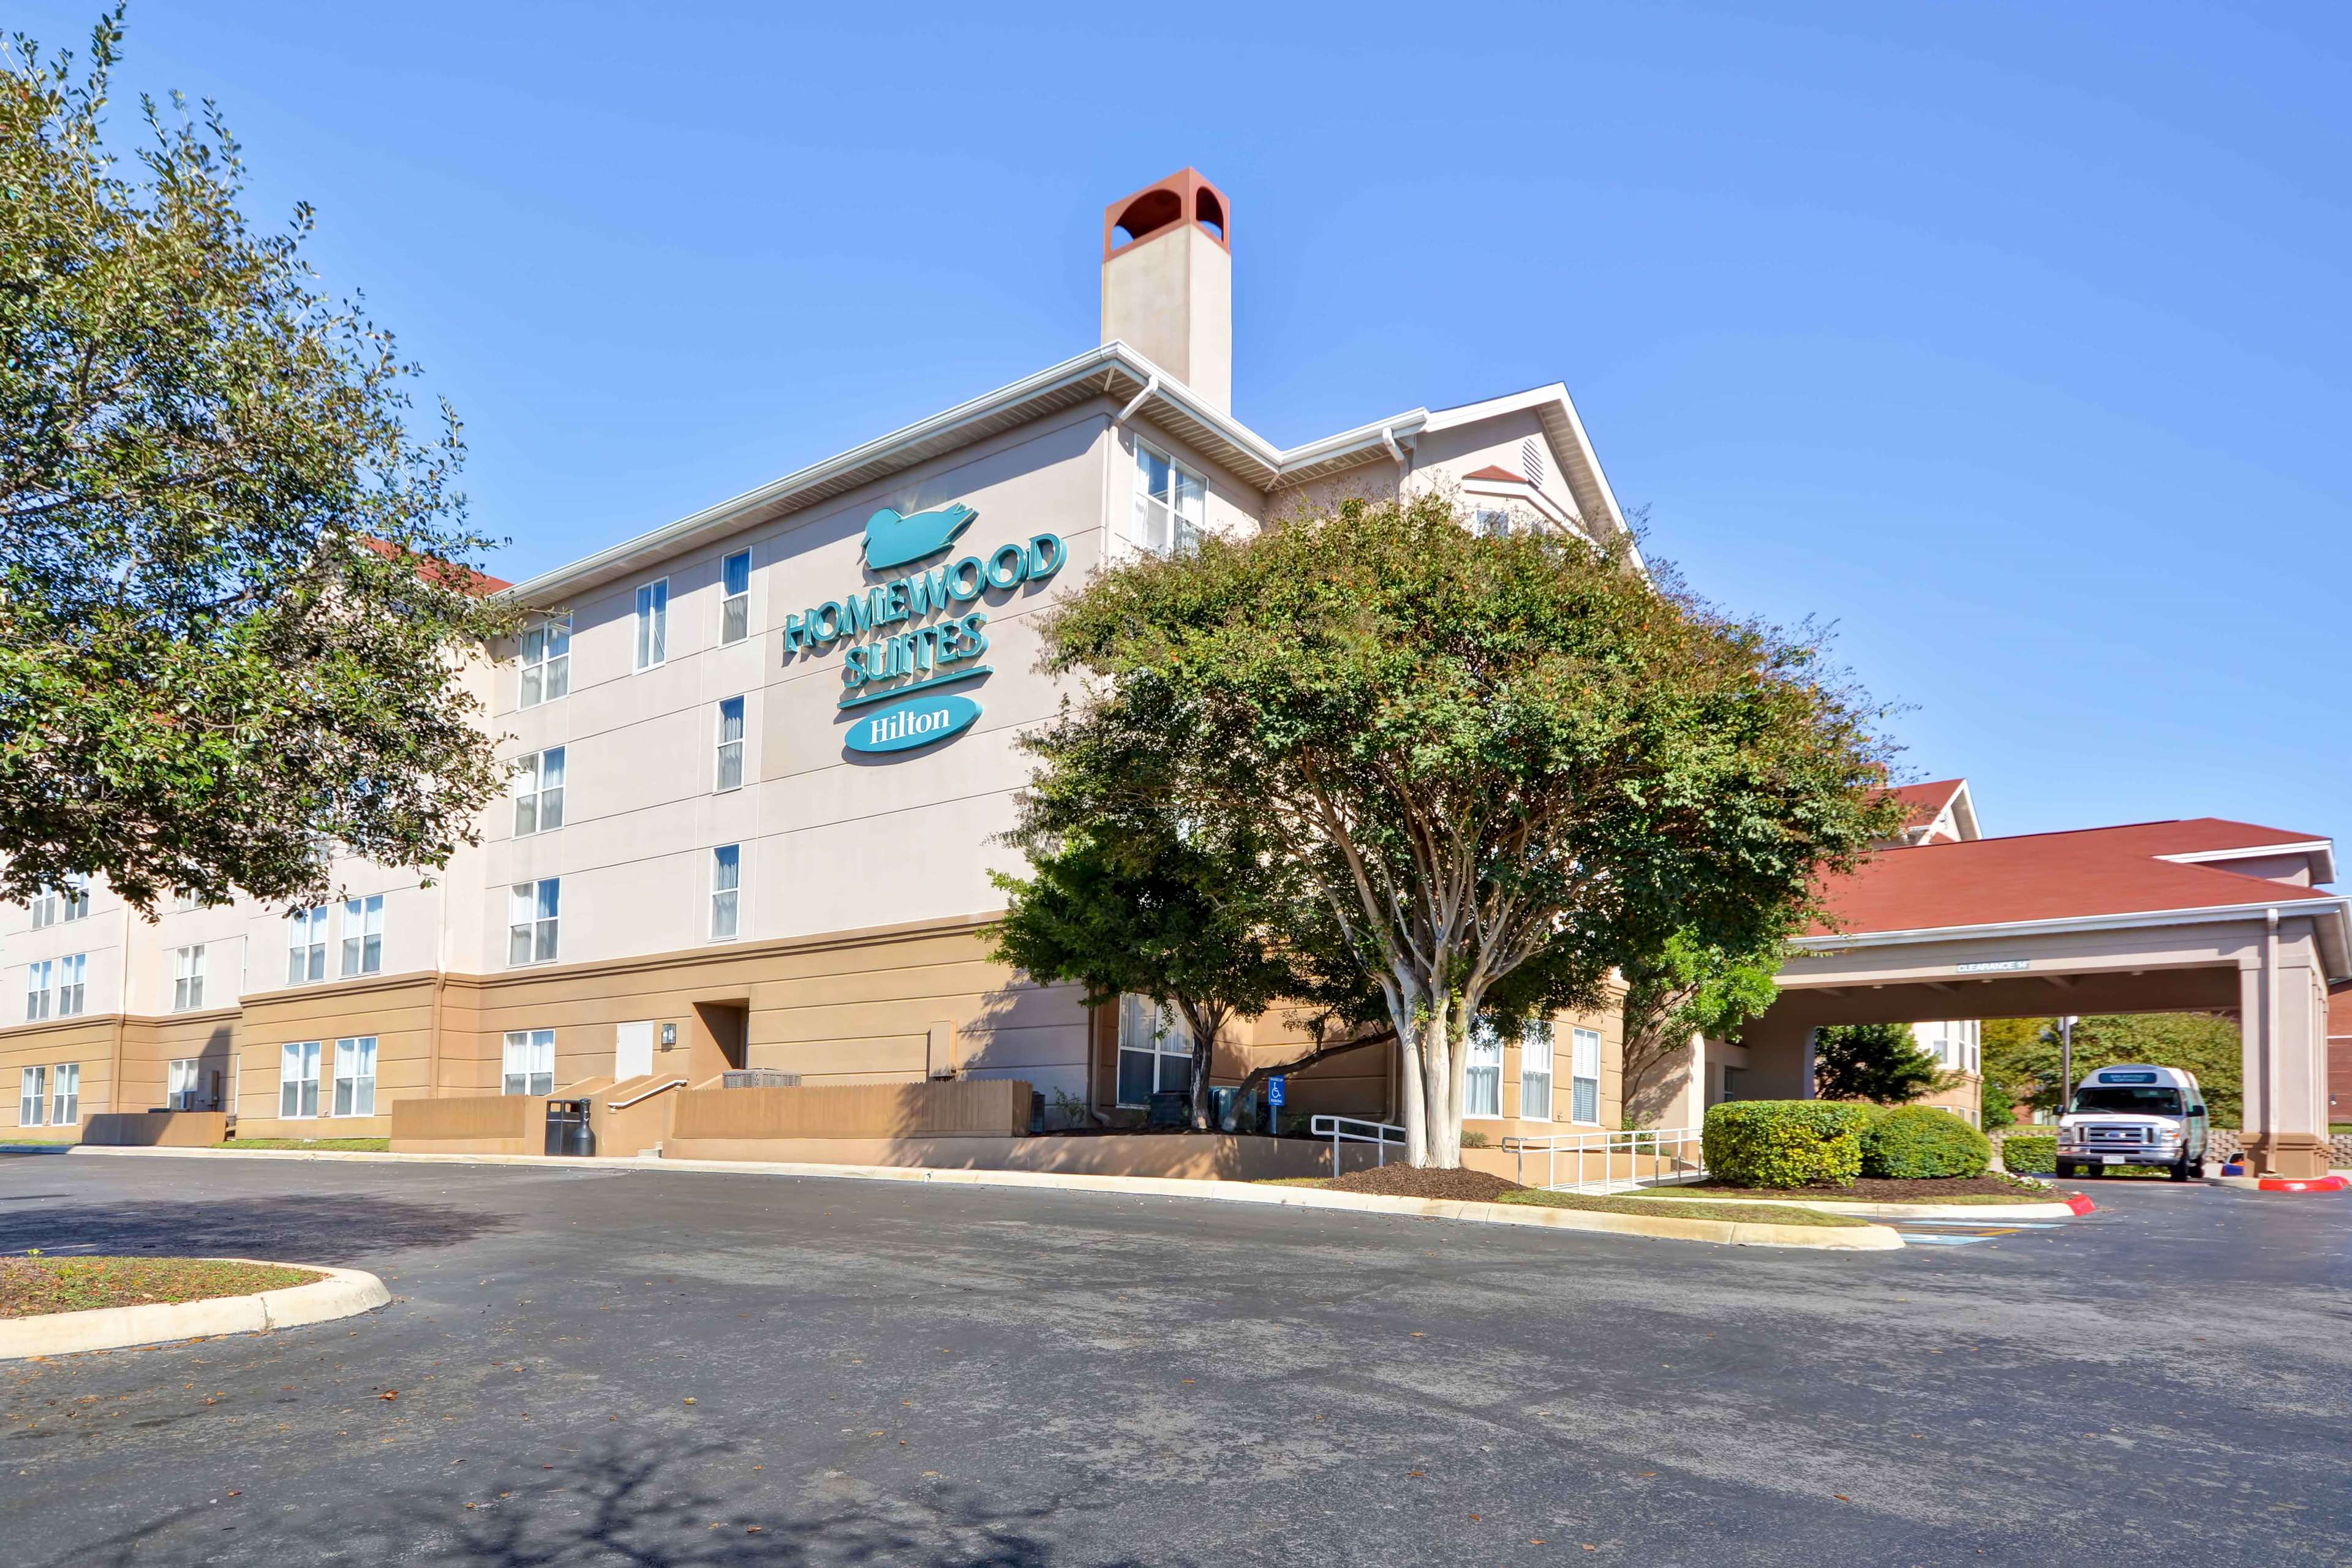 Homewood Suites by Hilton San Antonio-Northwest image 1